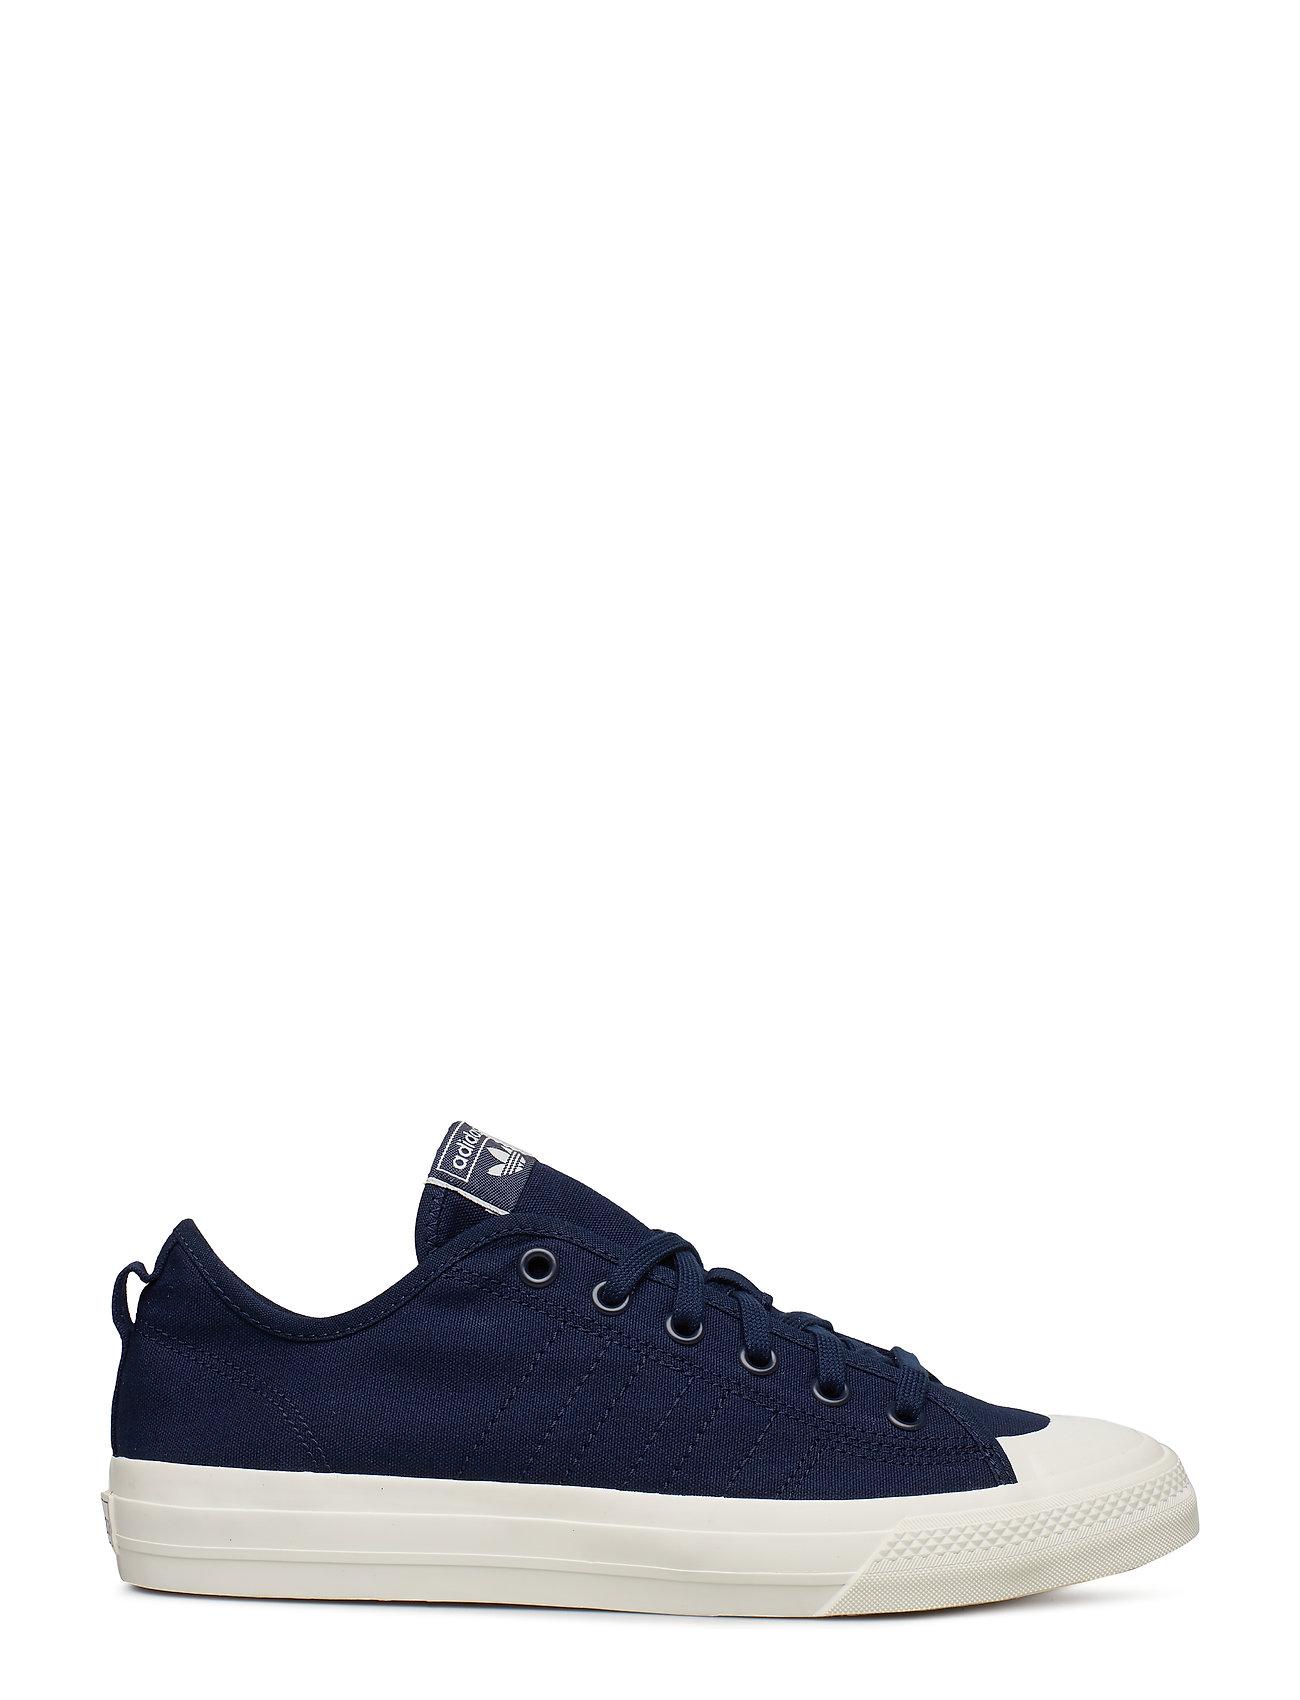 0b0724c1aafd8 CONAVY CONAVY OWHITE Adidas Nizza Rf sneakers for herre - Pashion.dk